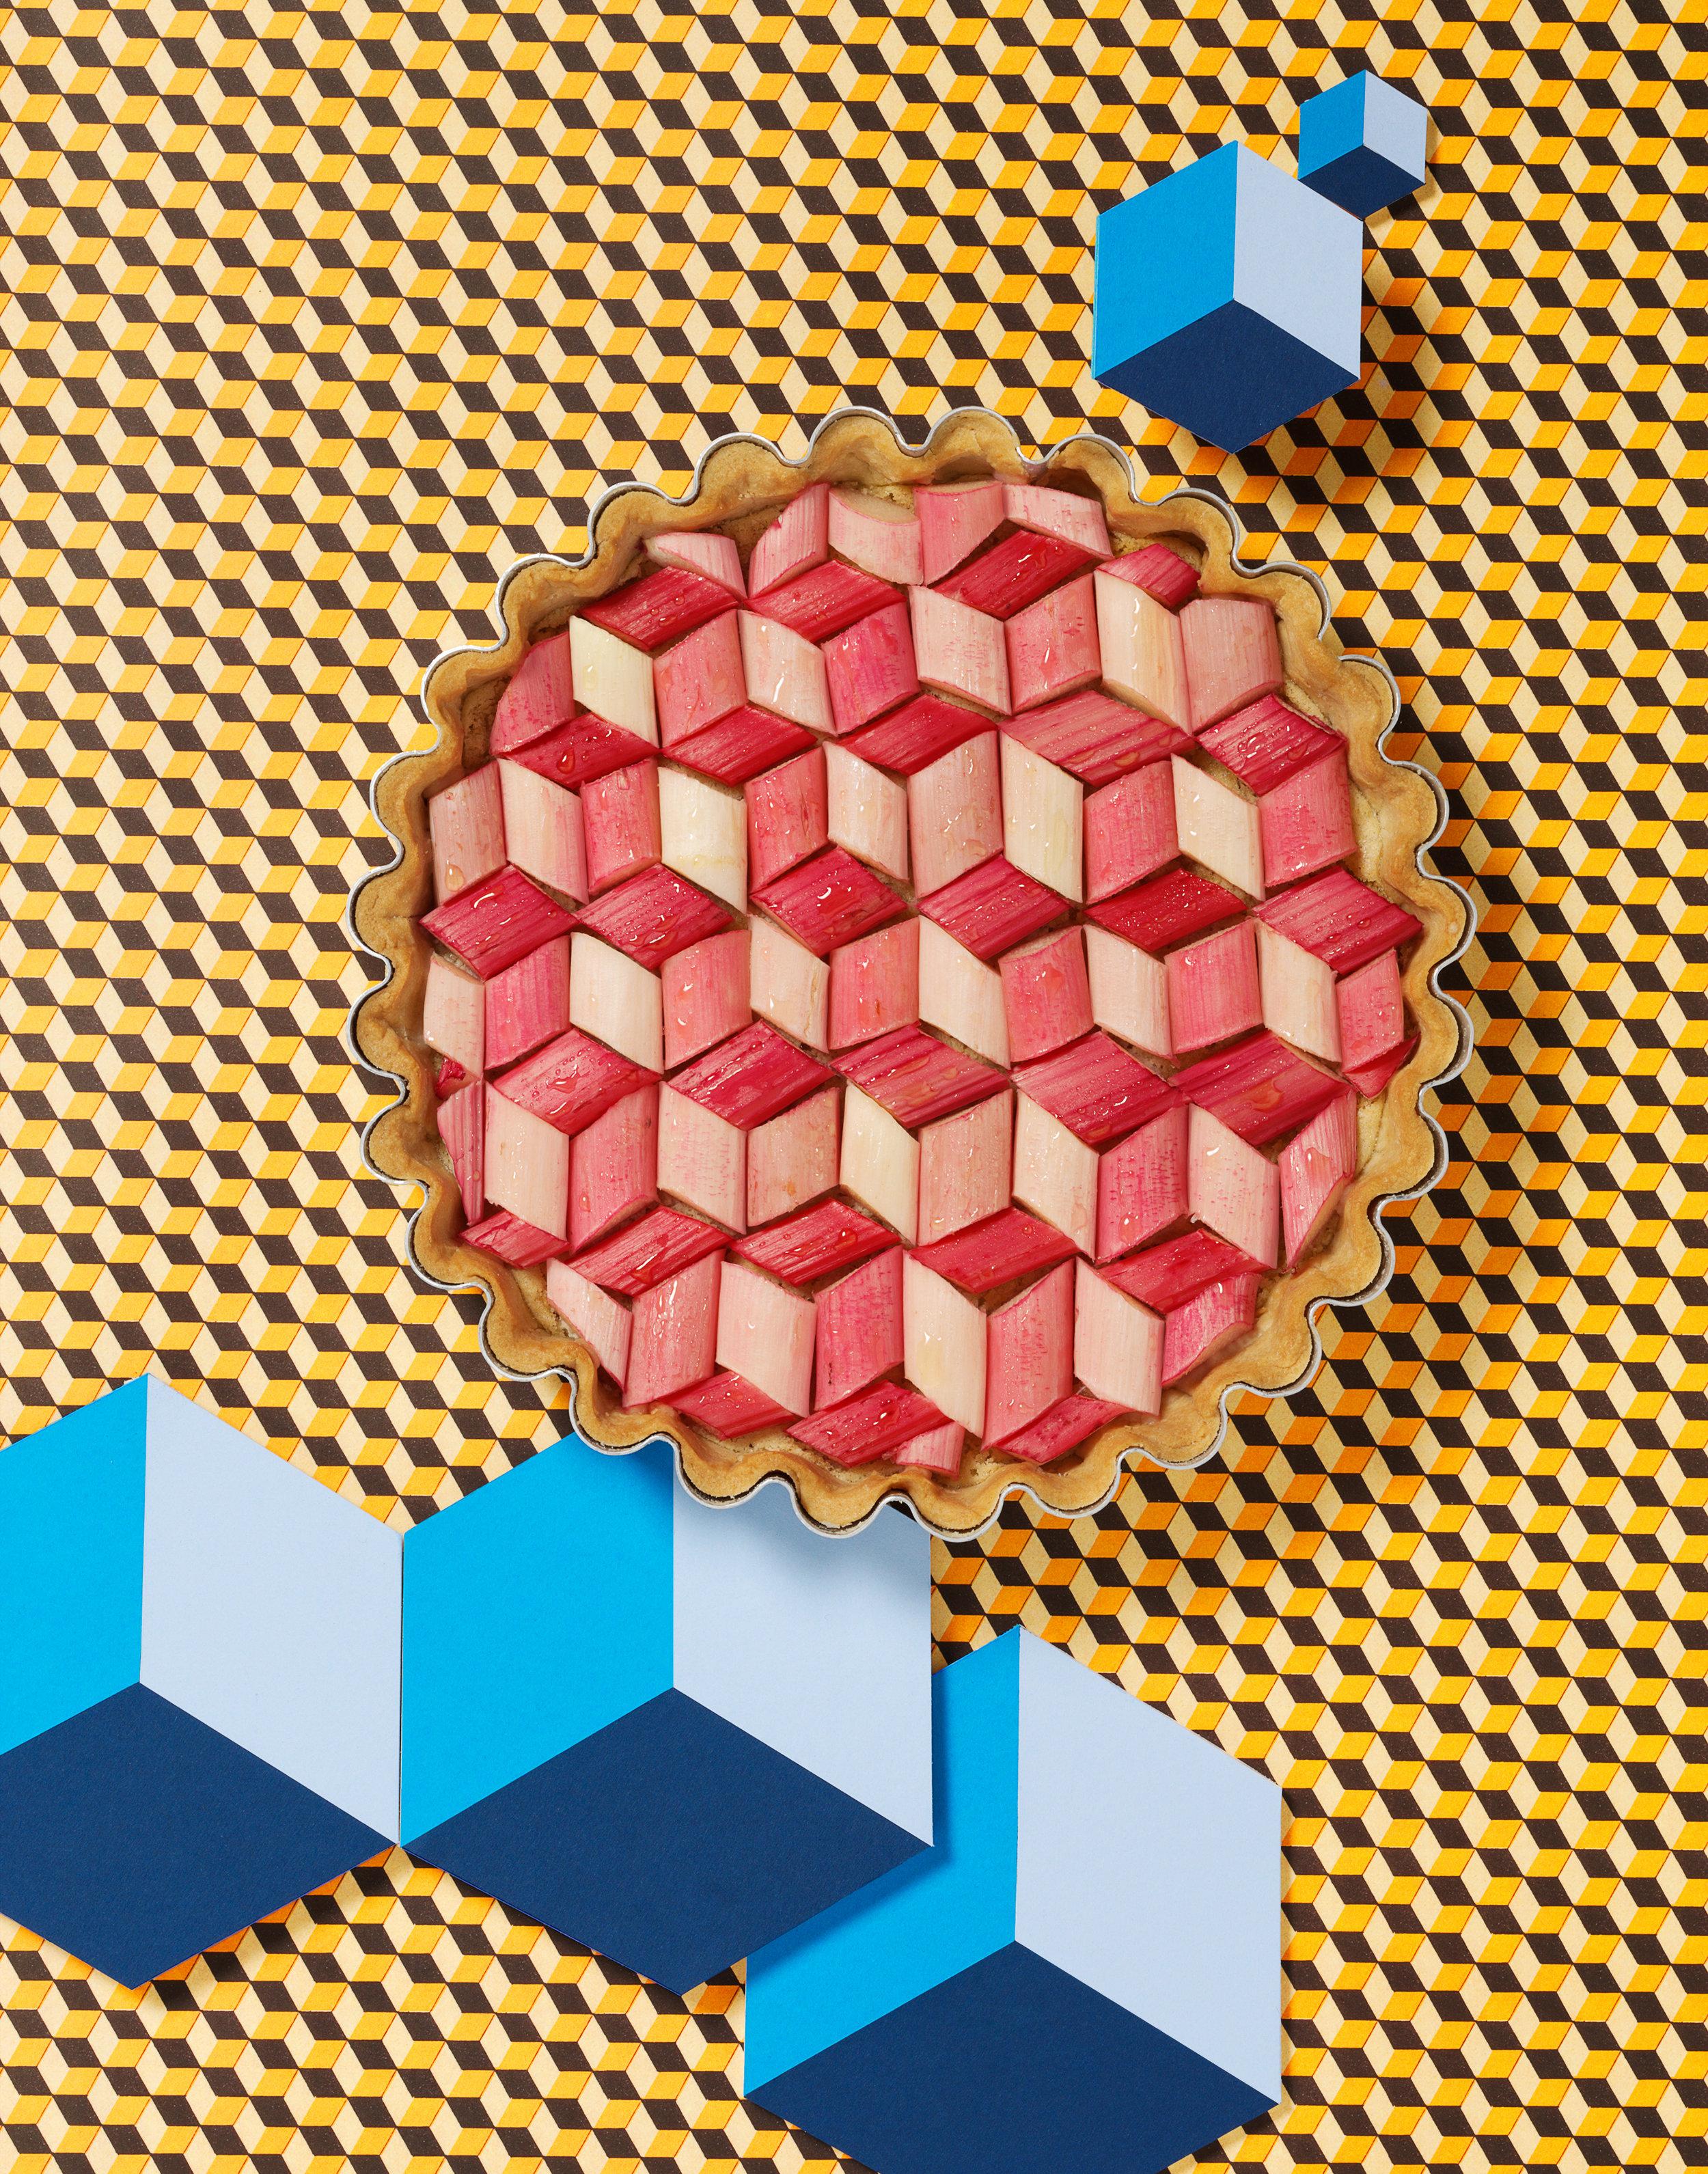 Cubed Pie Rhubarb RET11x14HR.jpg